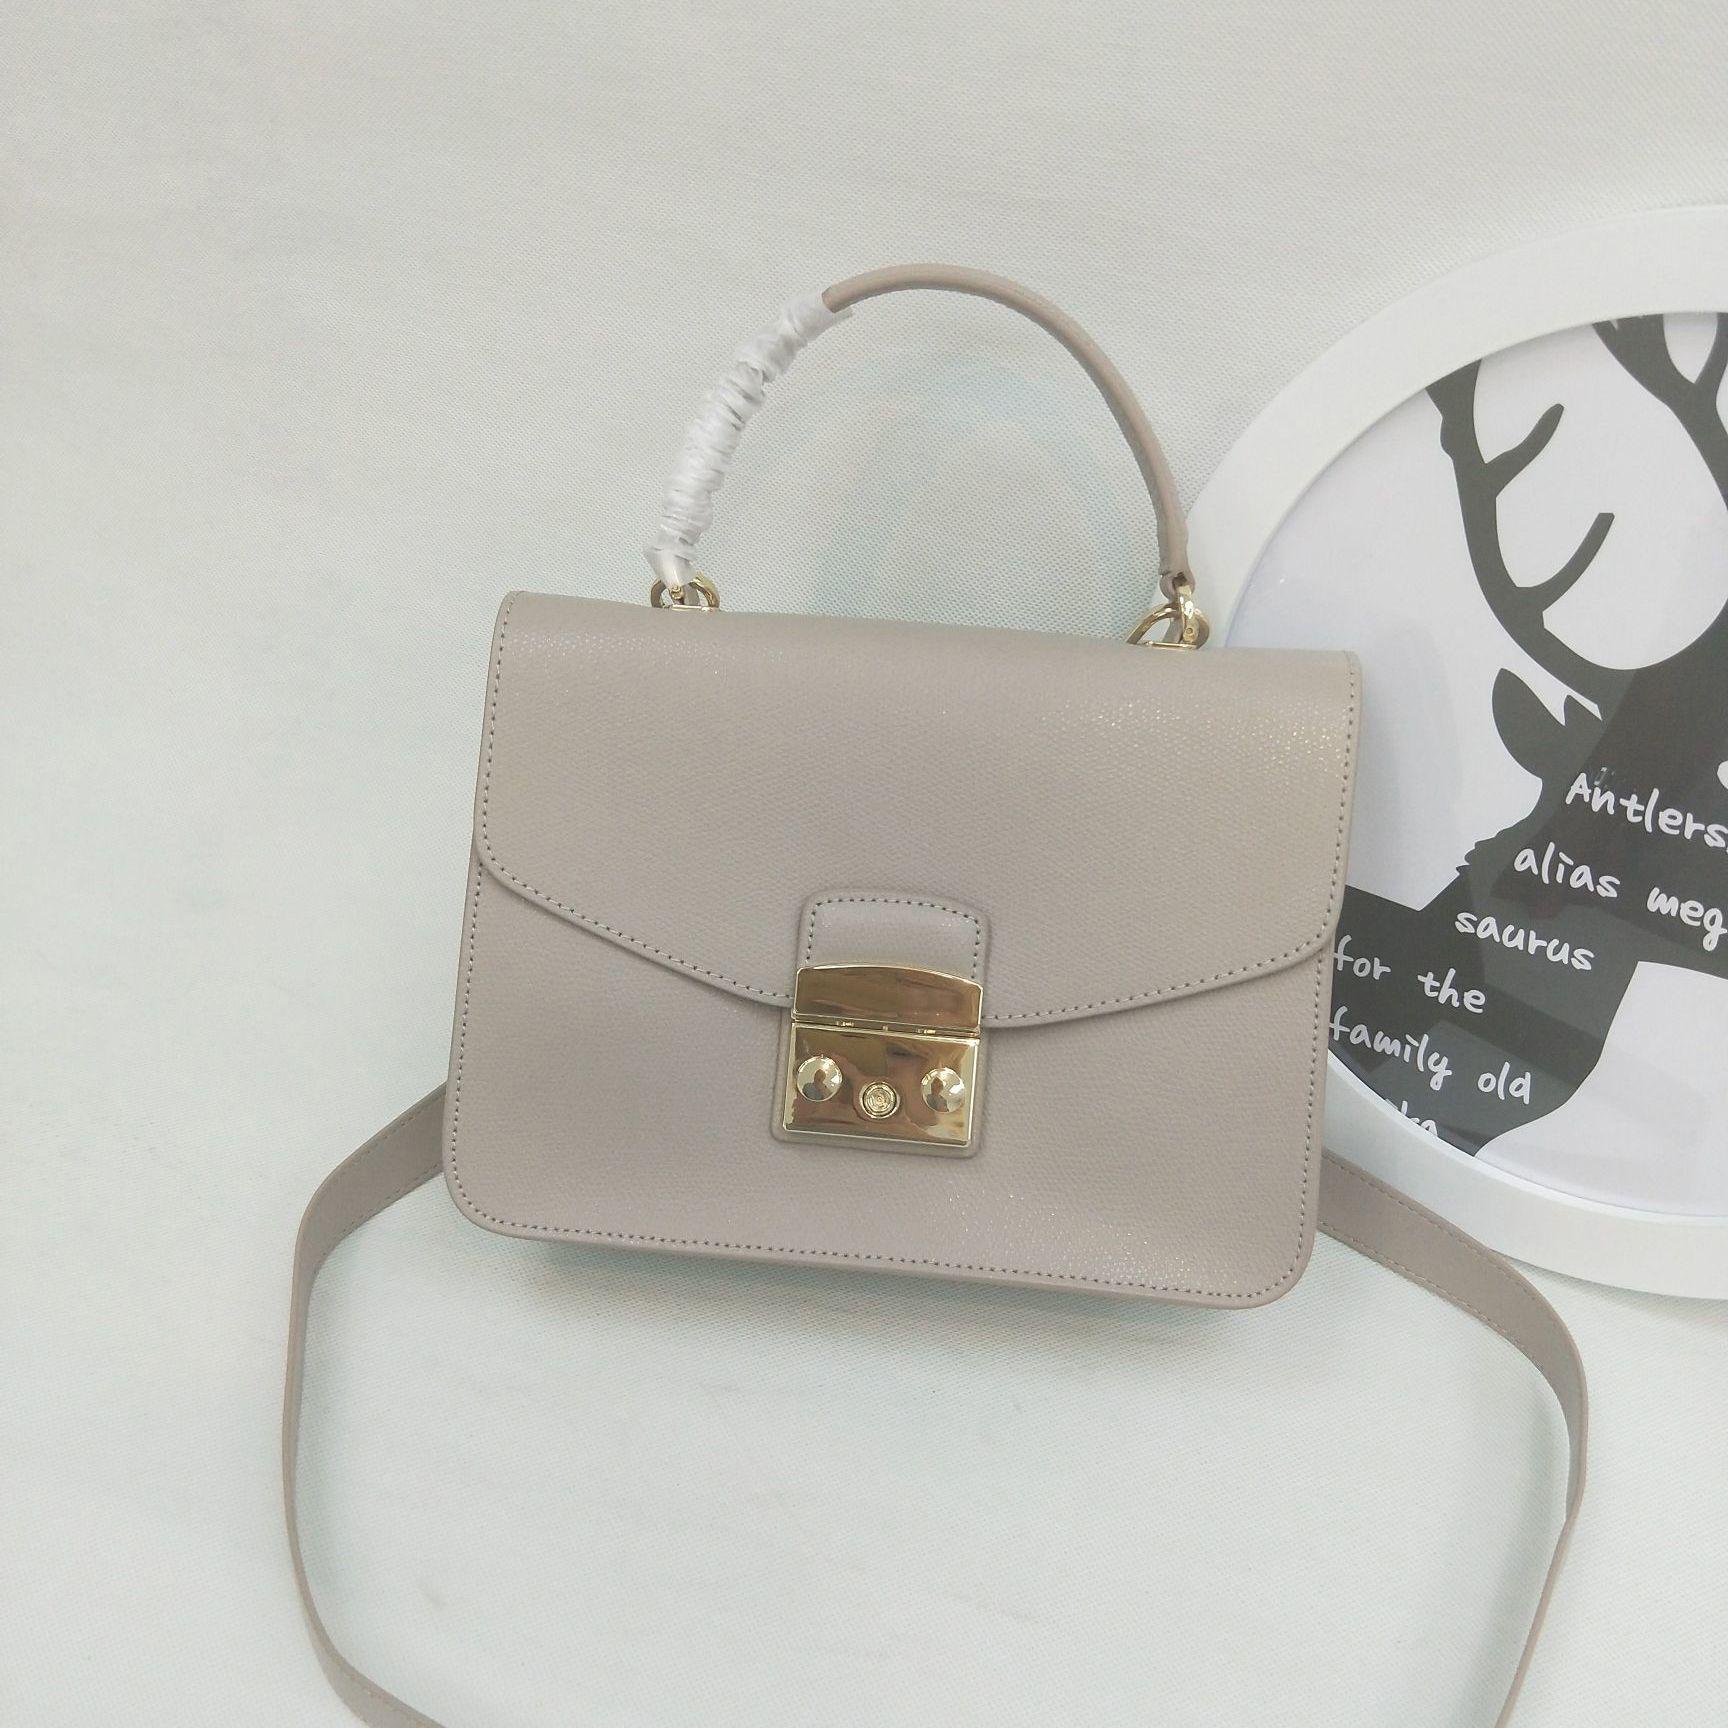 Totes de luxe de luxe sacs à main de luxe sacs de qualité supérieure Sacs femme Bandbody Sacs de marque de luxe Pourse de luxe Sac d'embrayage Stockage Cosmétique